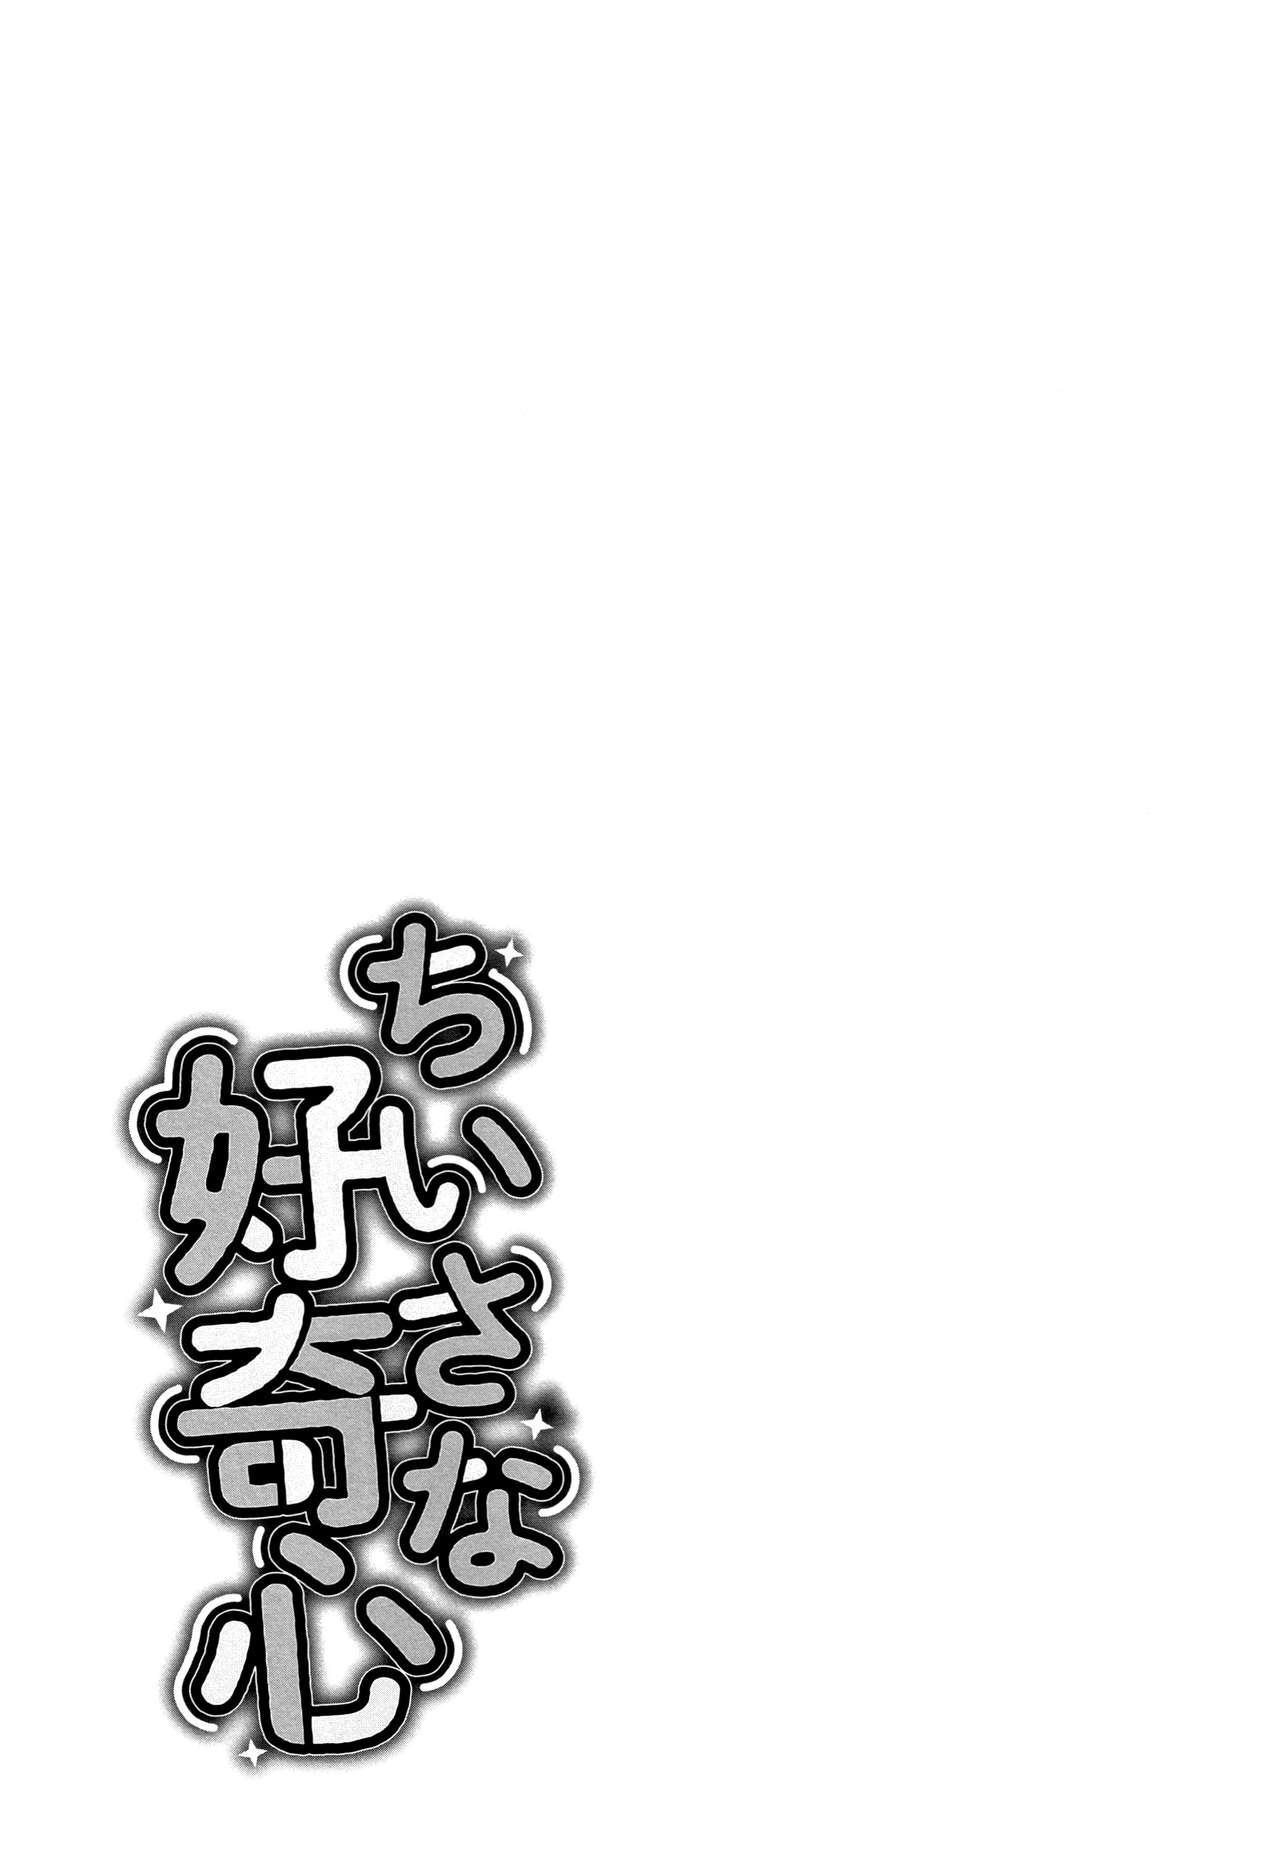 Chiisana Koukishin 163